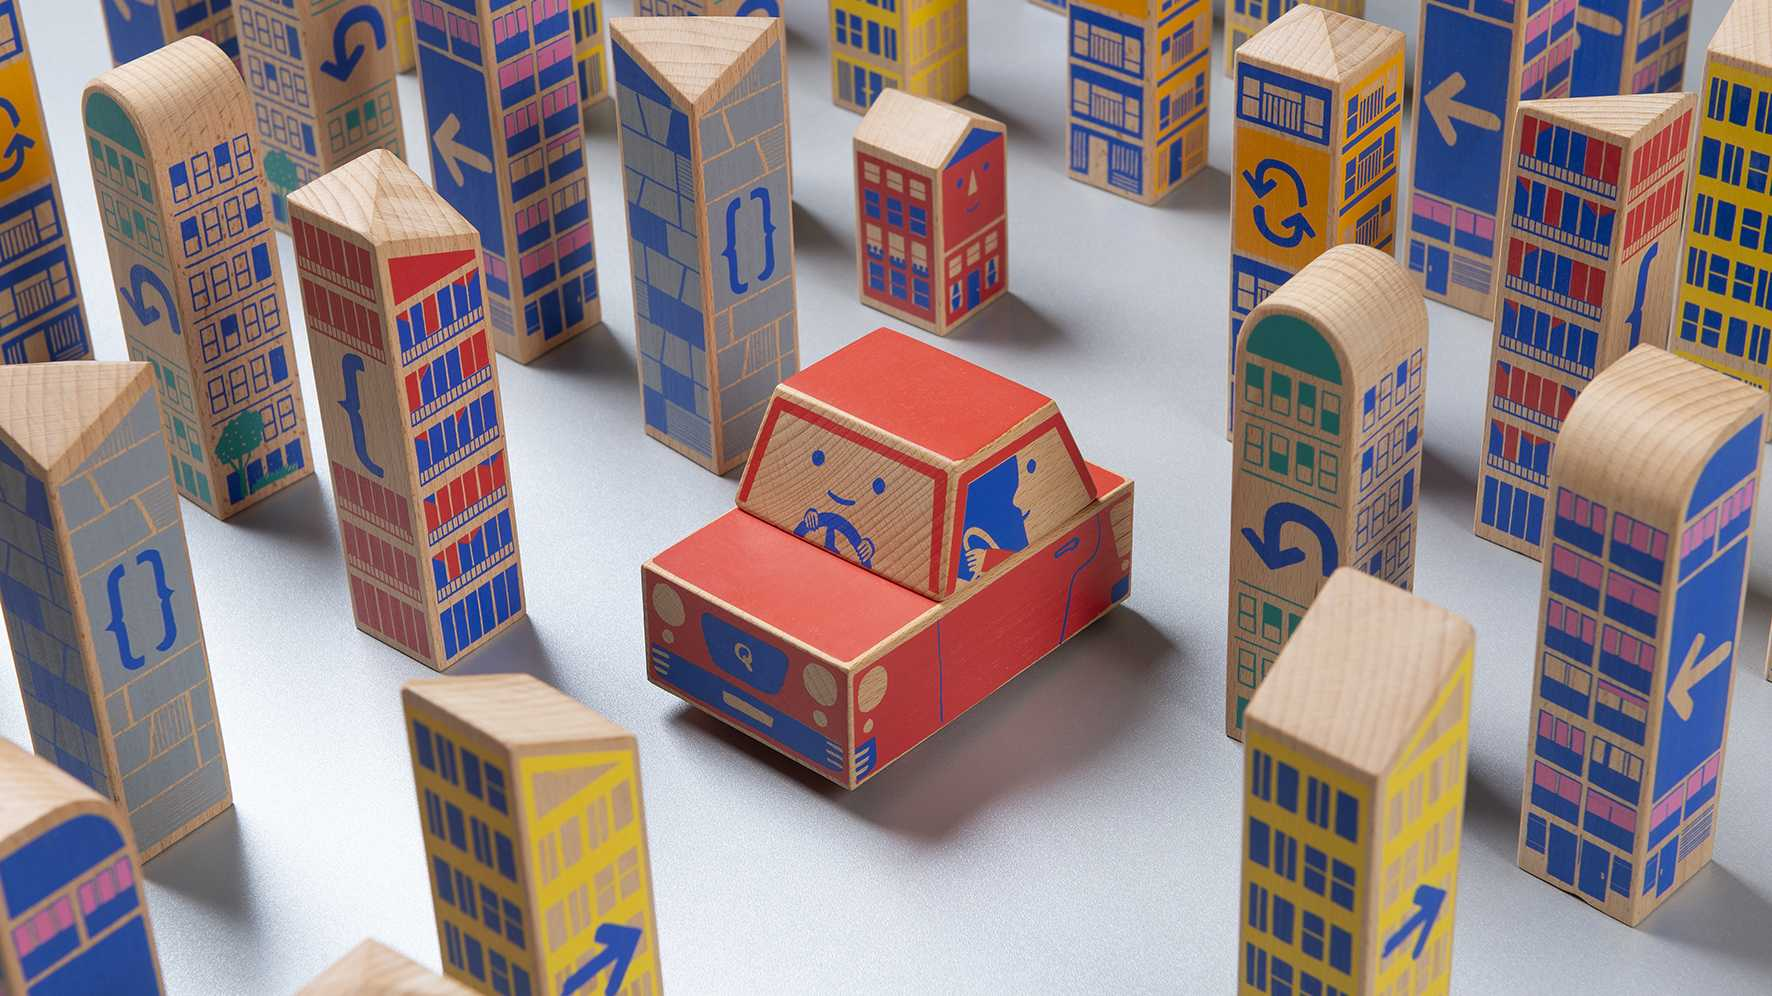 Maker-Projekte auf Kickstarter: Cody Block und Quarantine Occupation Kits